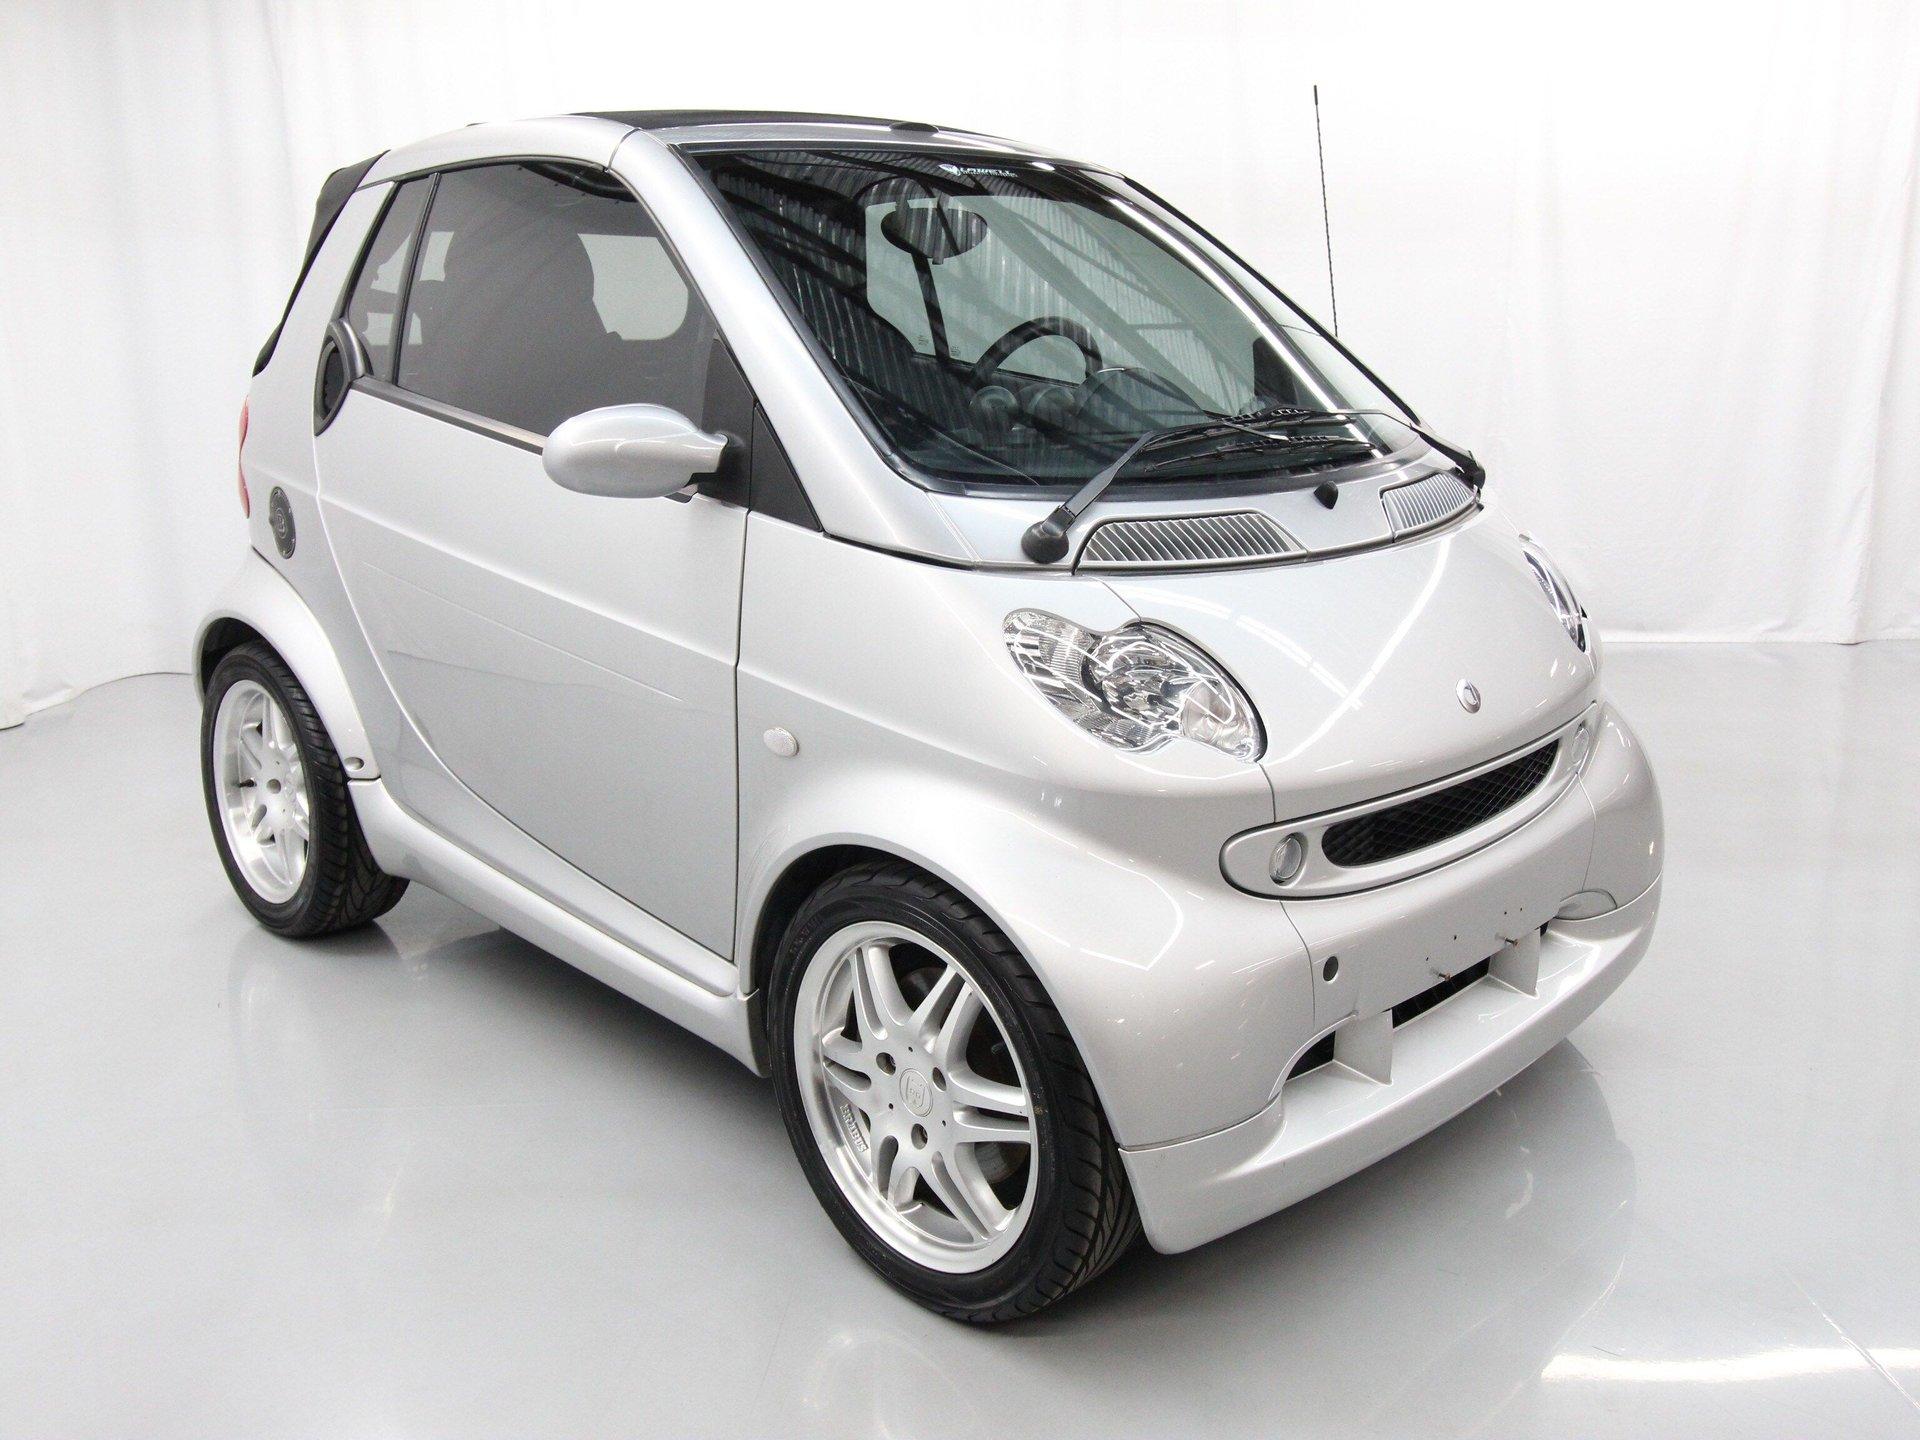 2001 Smart Fourtwo